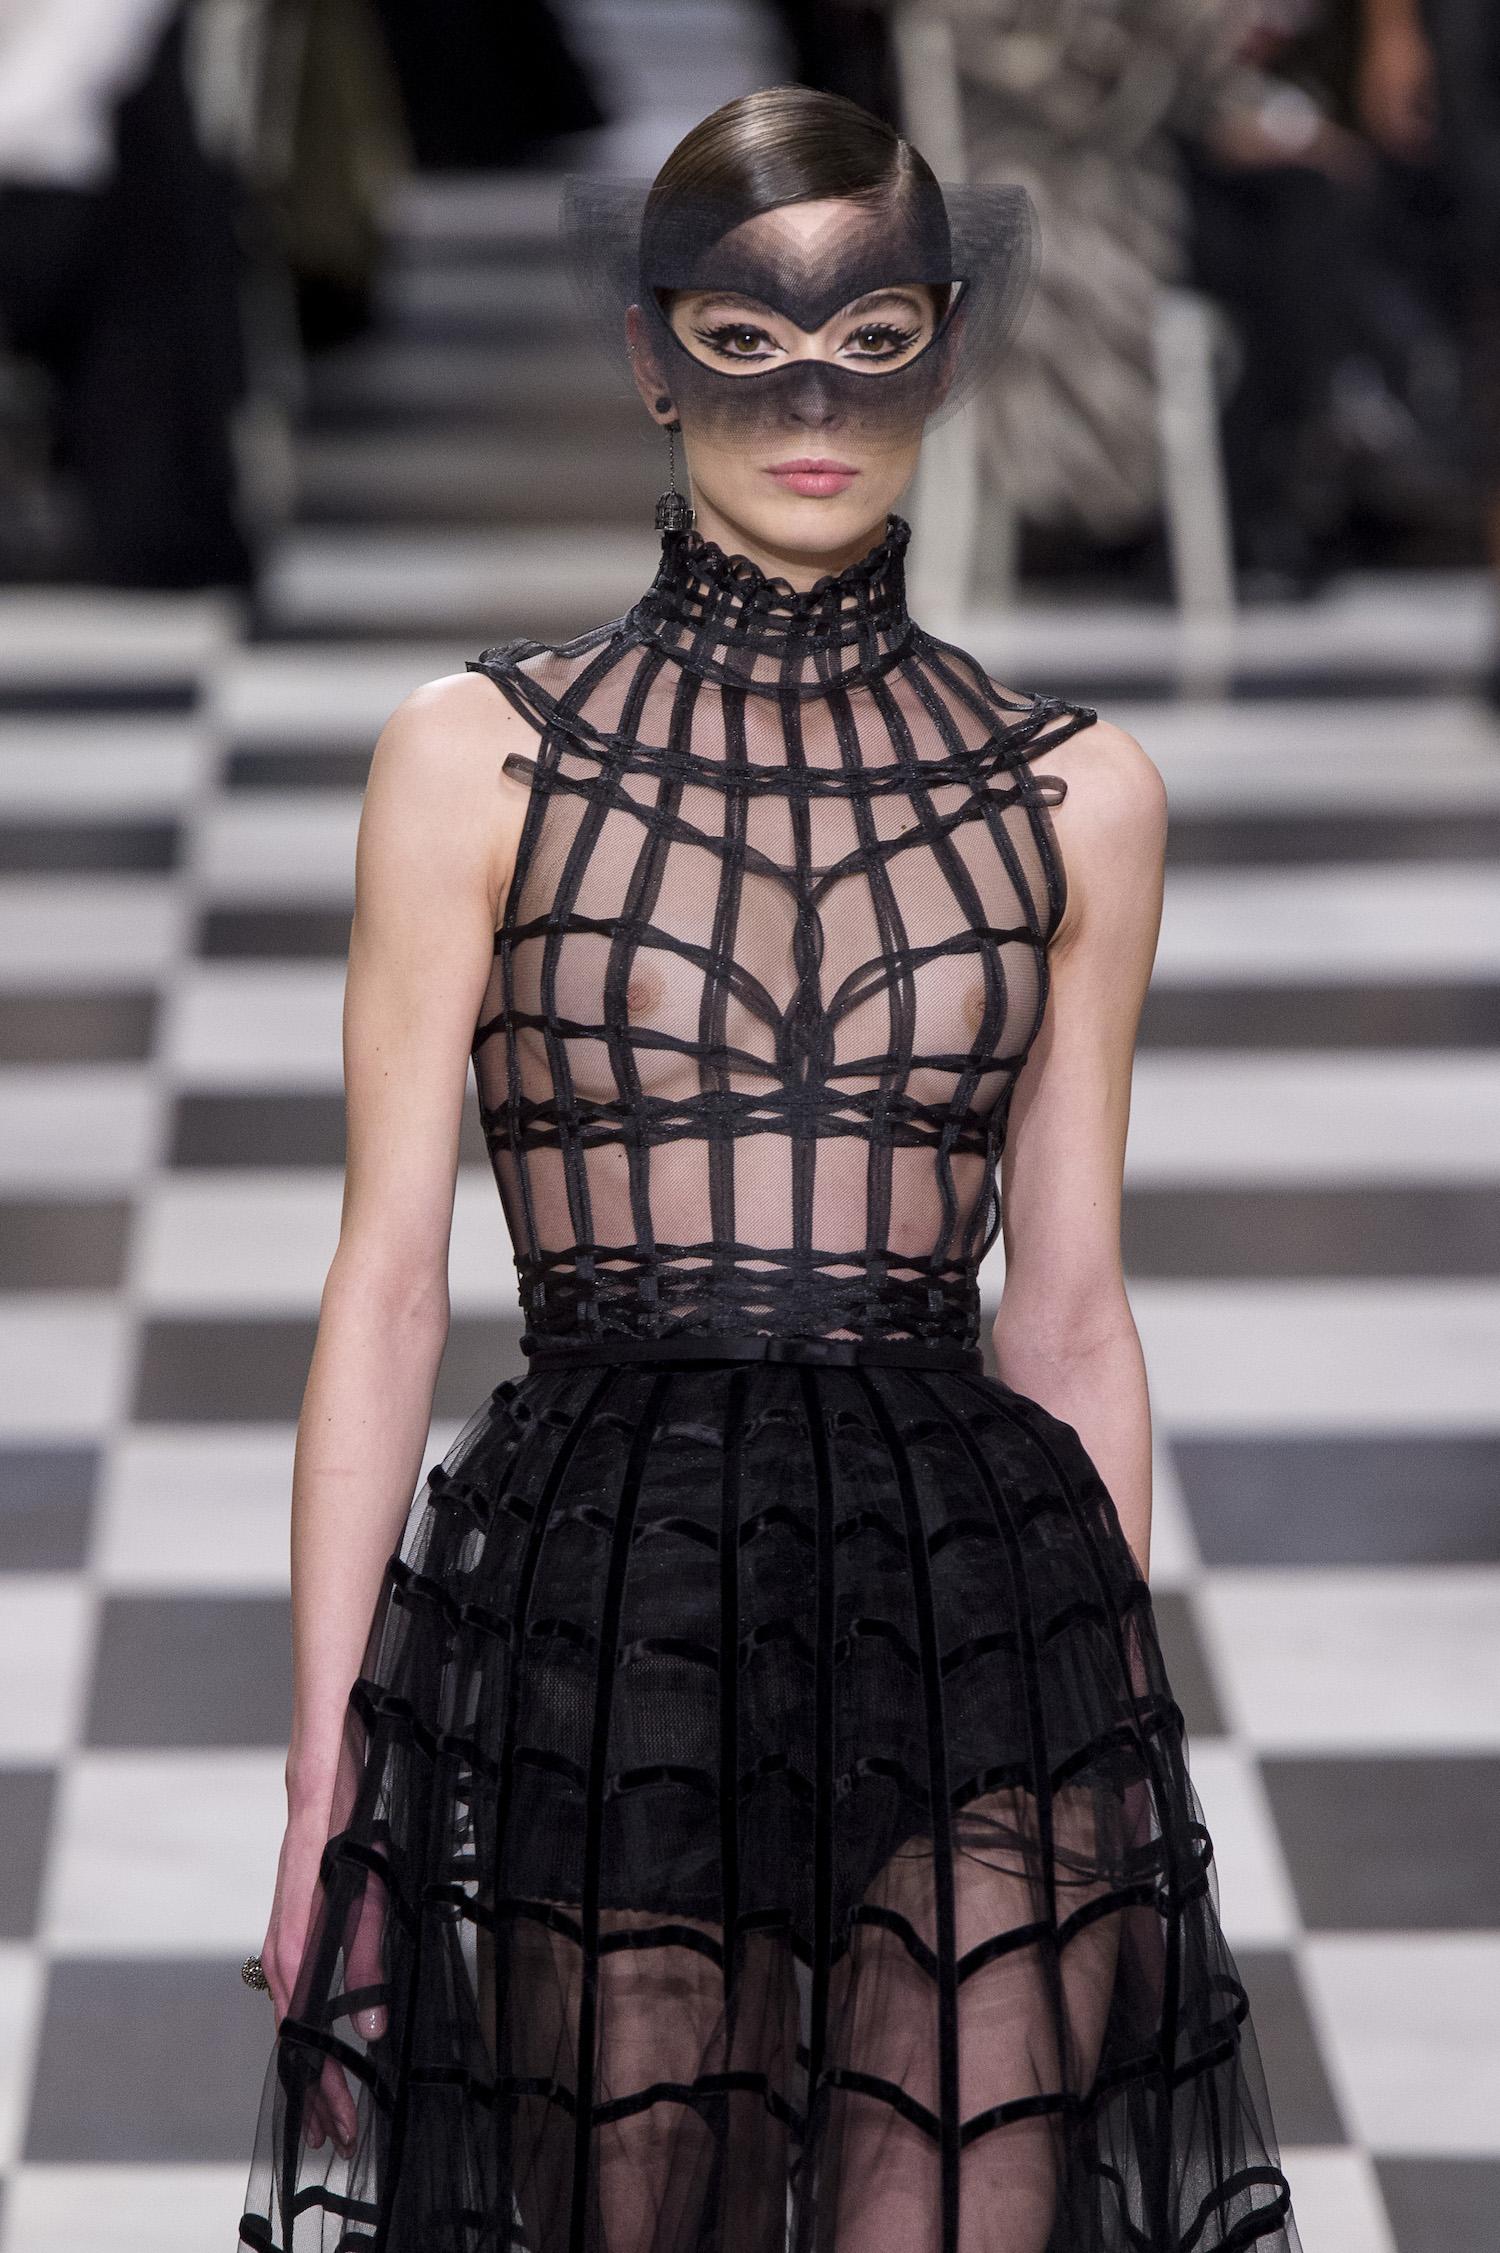 Christian Dior Couture Modepilot Sex Toys